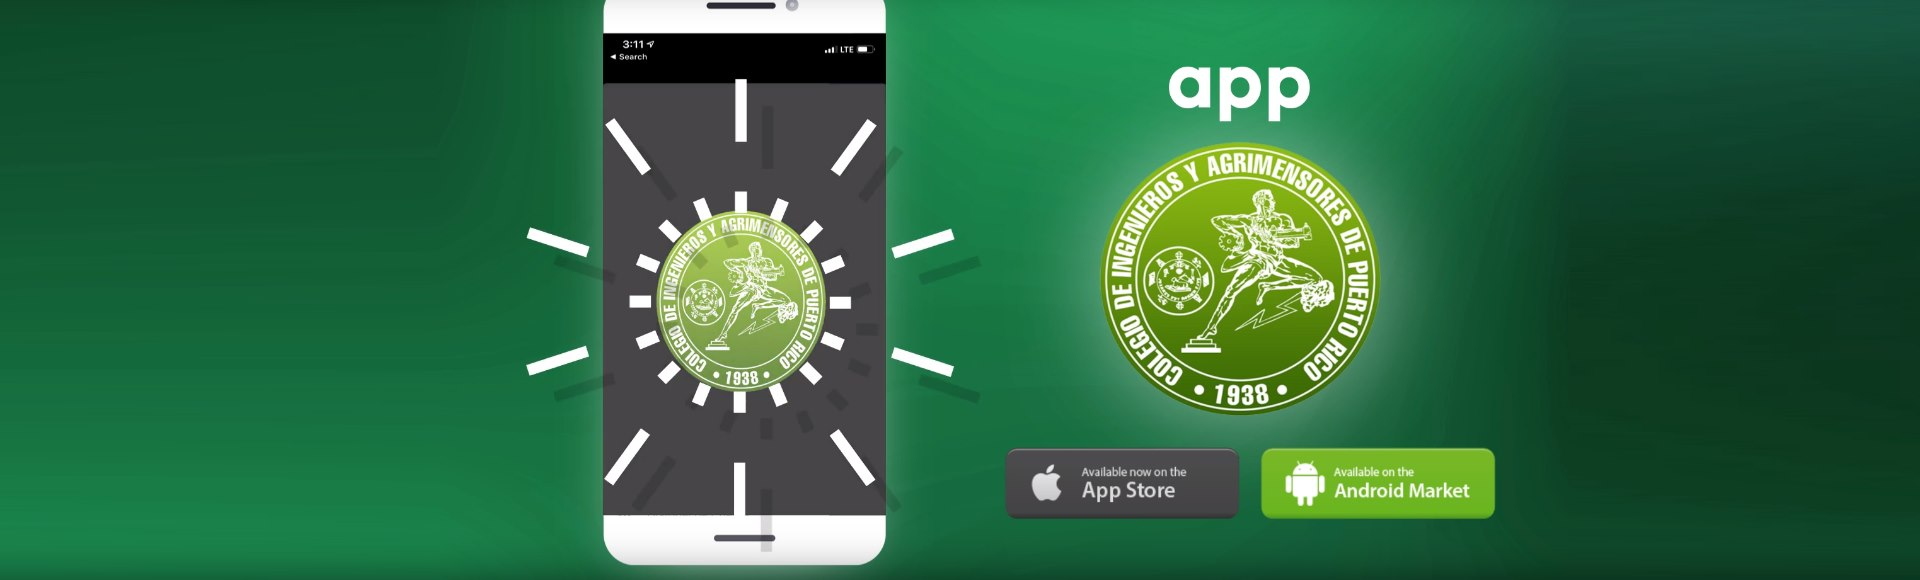 CIAPR Mobile App